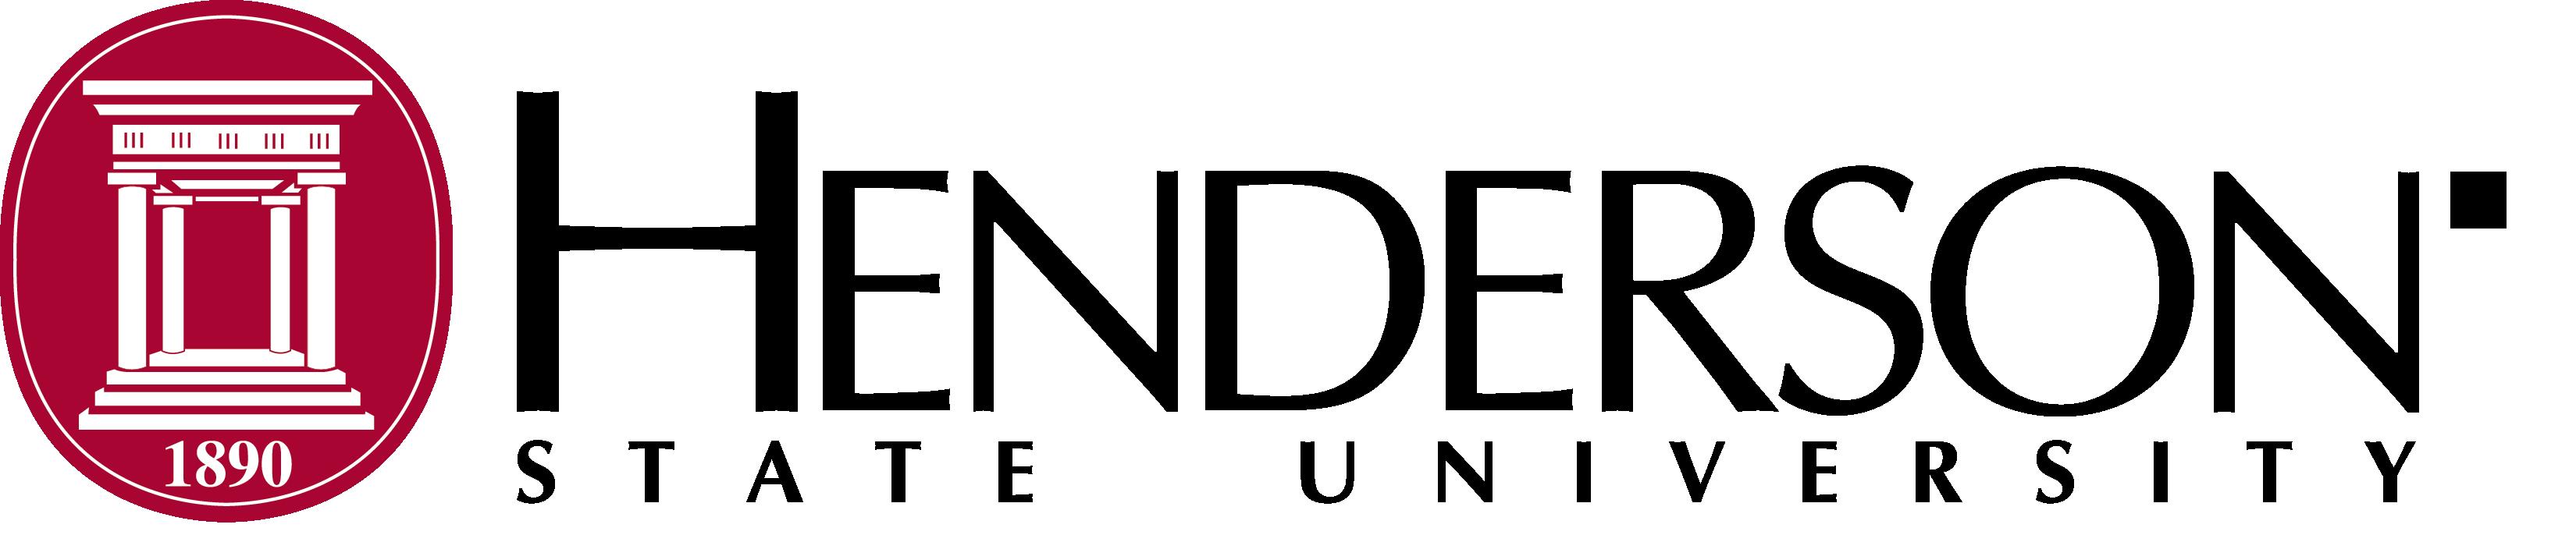 Henderson State University Logo